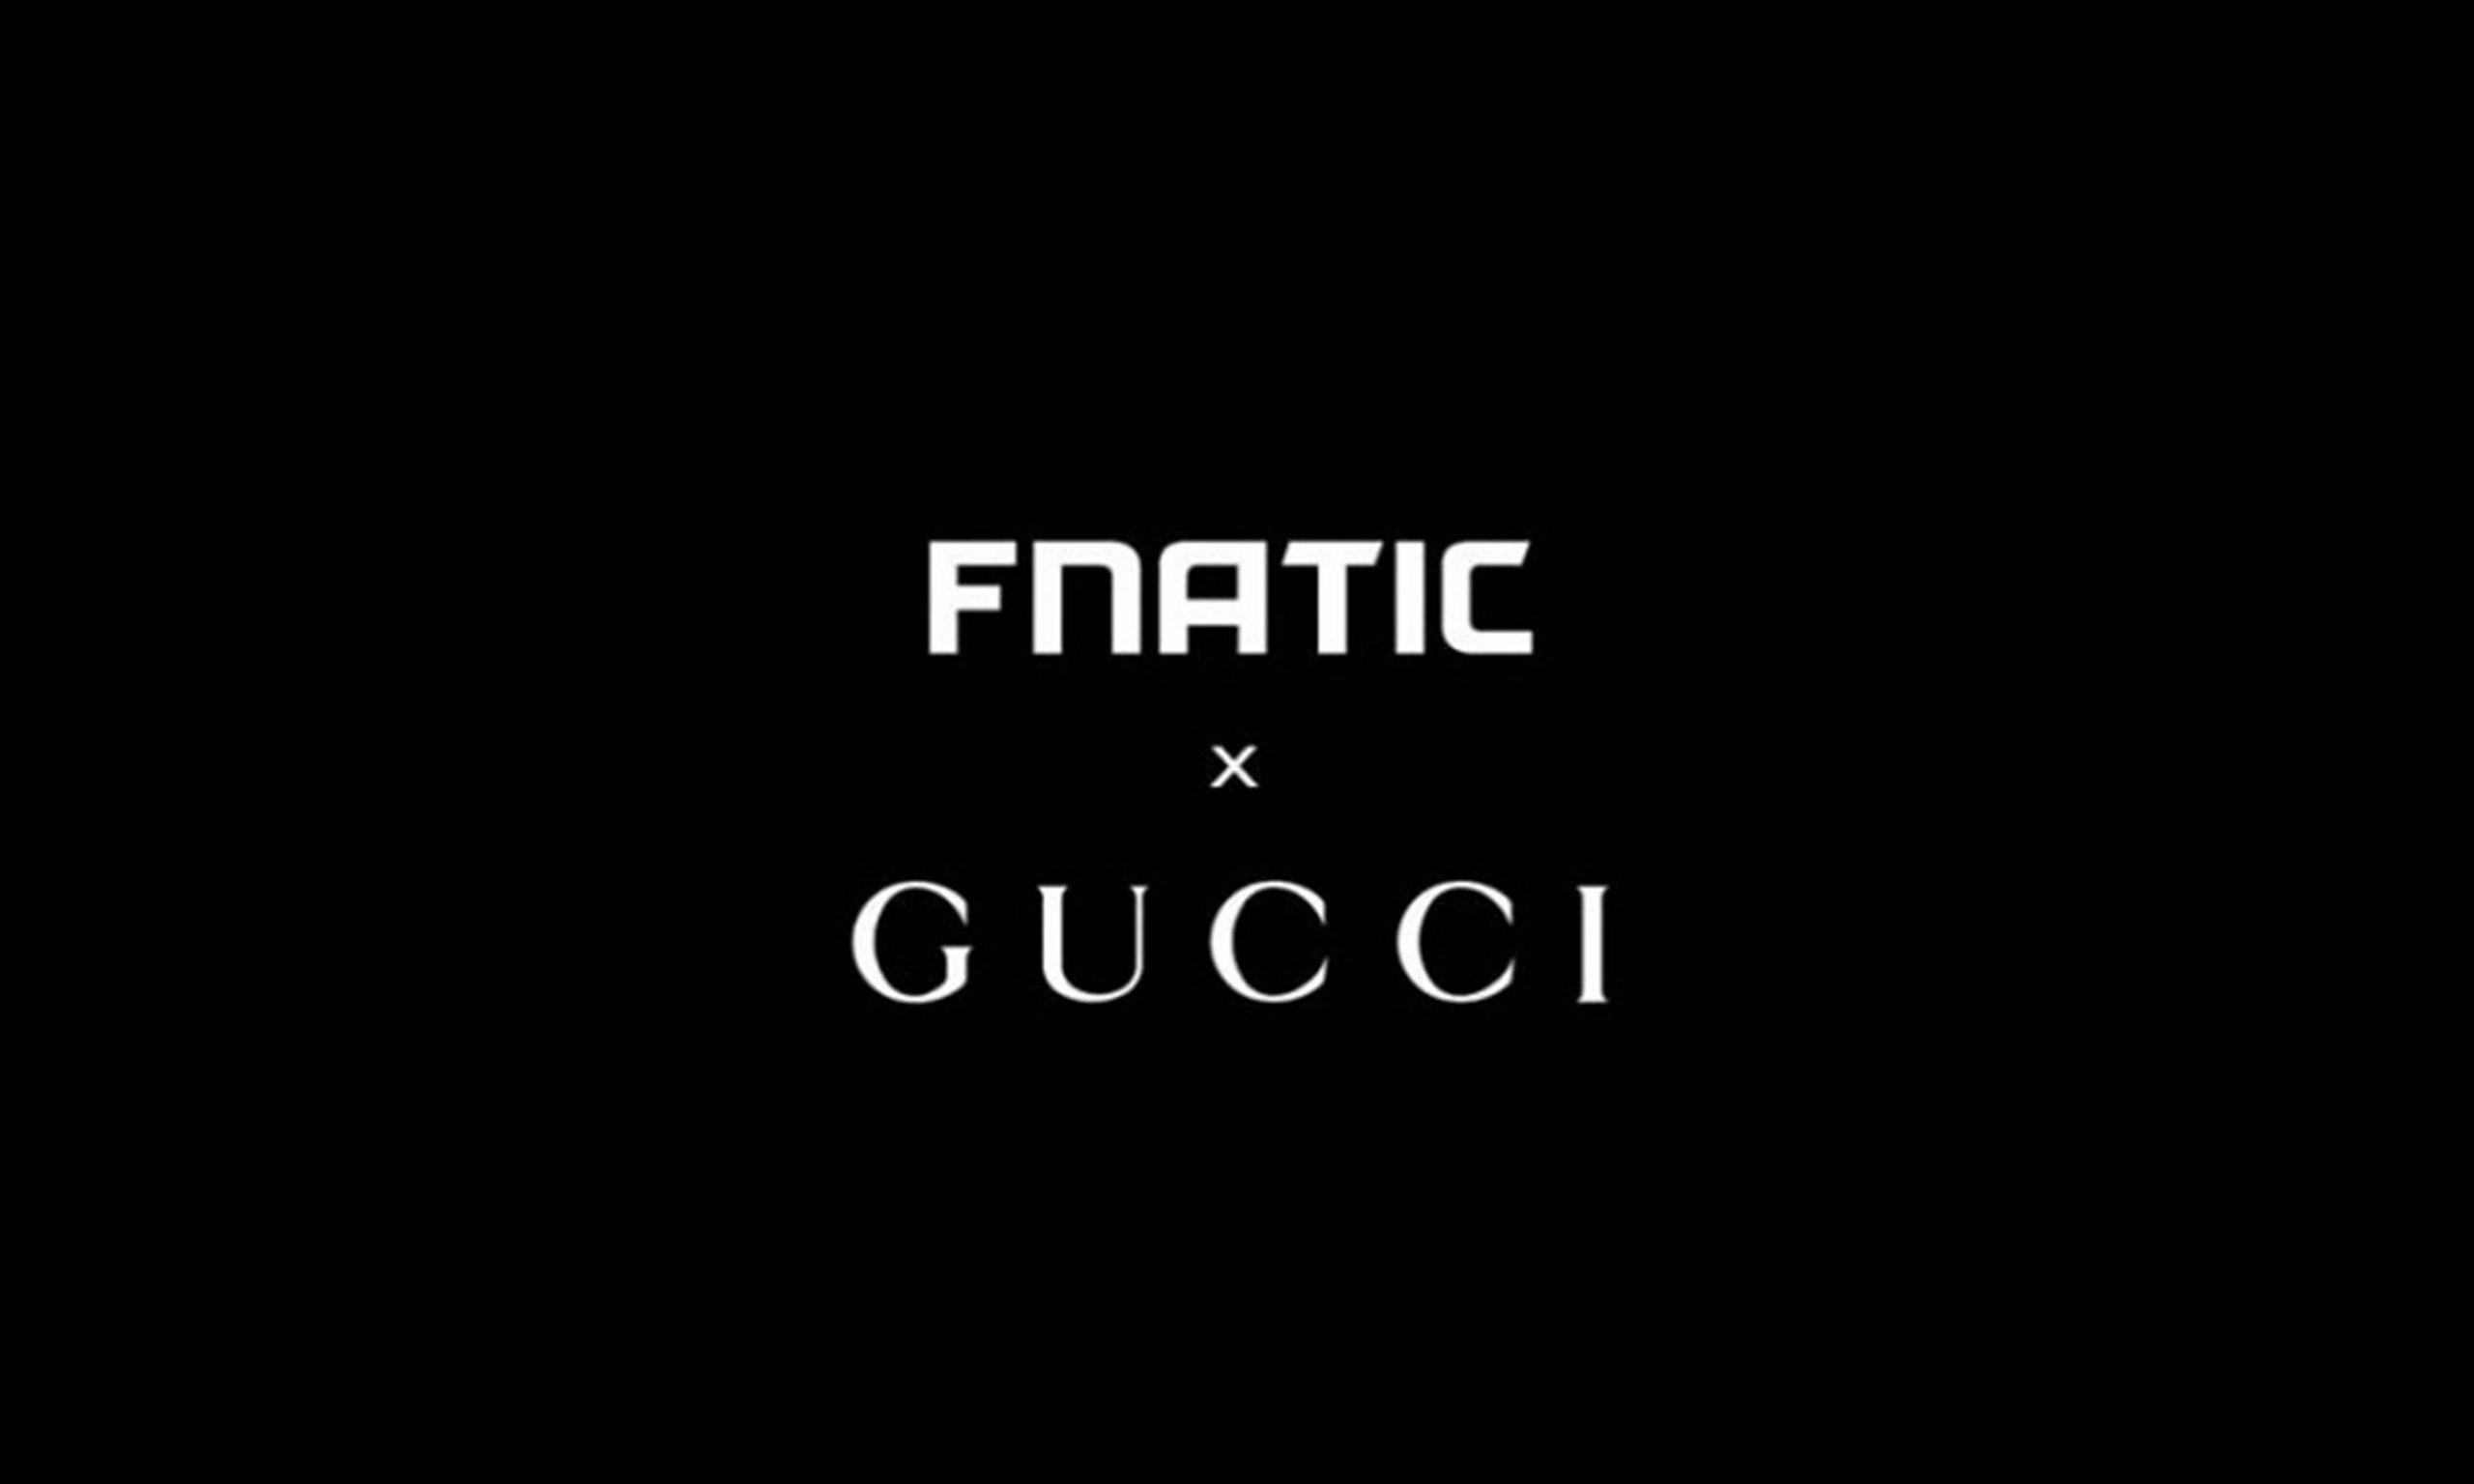 FNATIC 宣布将与 Gucci 合作打造联名商品